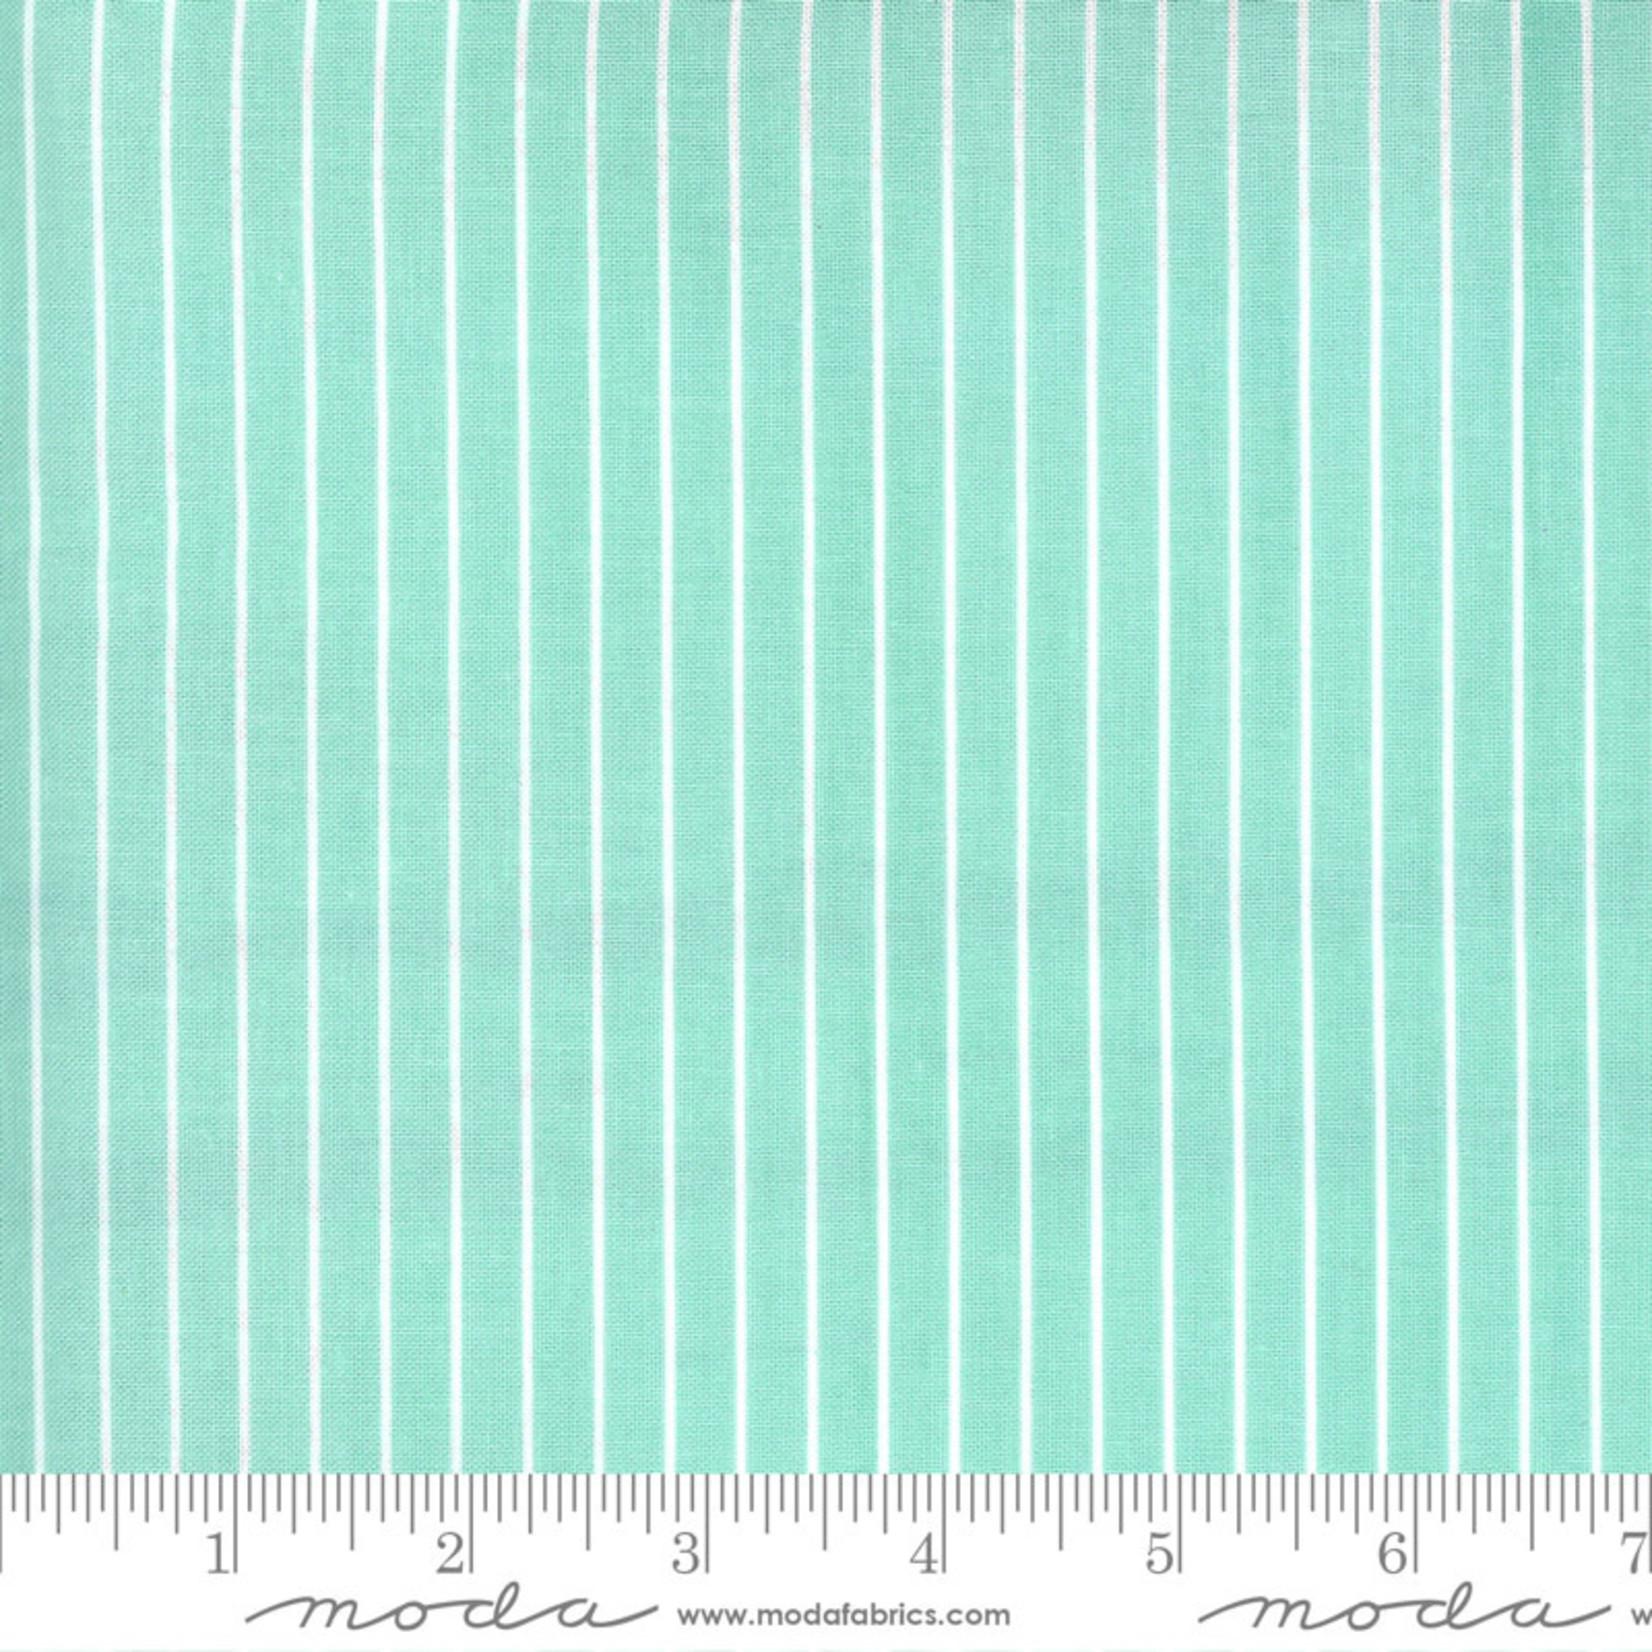 Bonnie & Camille Sunday Stroll, Wide Stripe, Aqua 55228 14 $0.20 per cm or $20/m